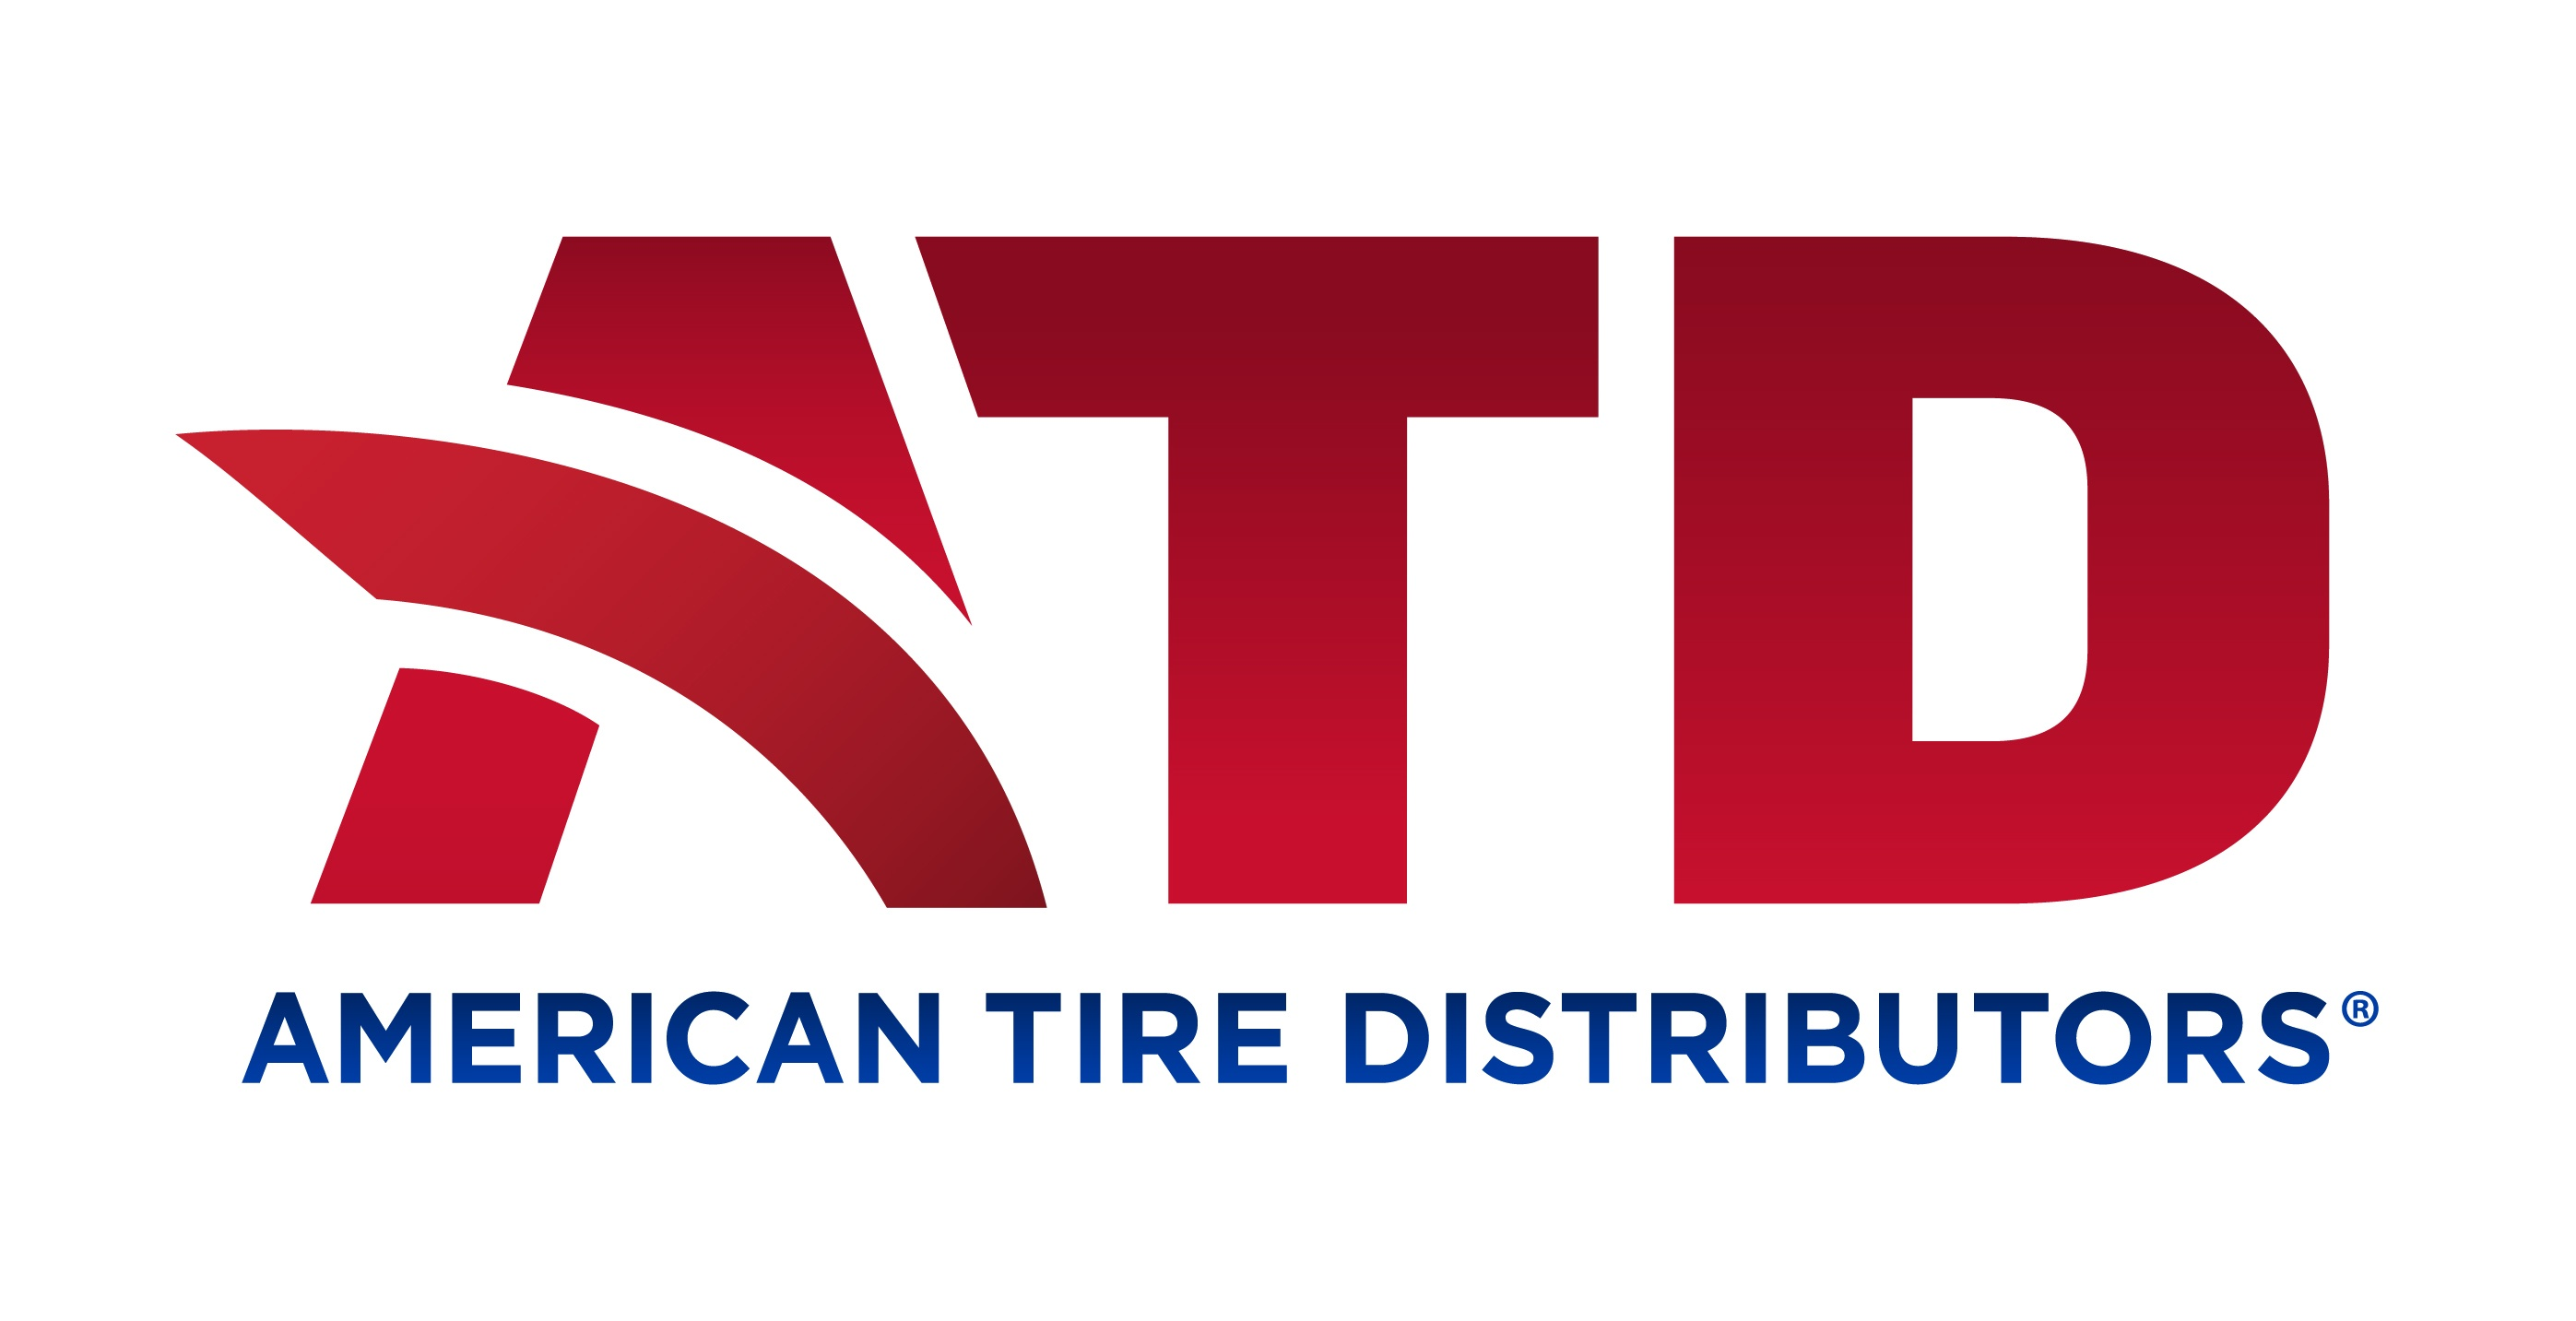 American Tire